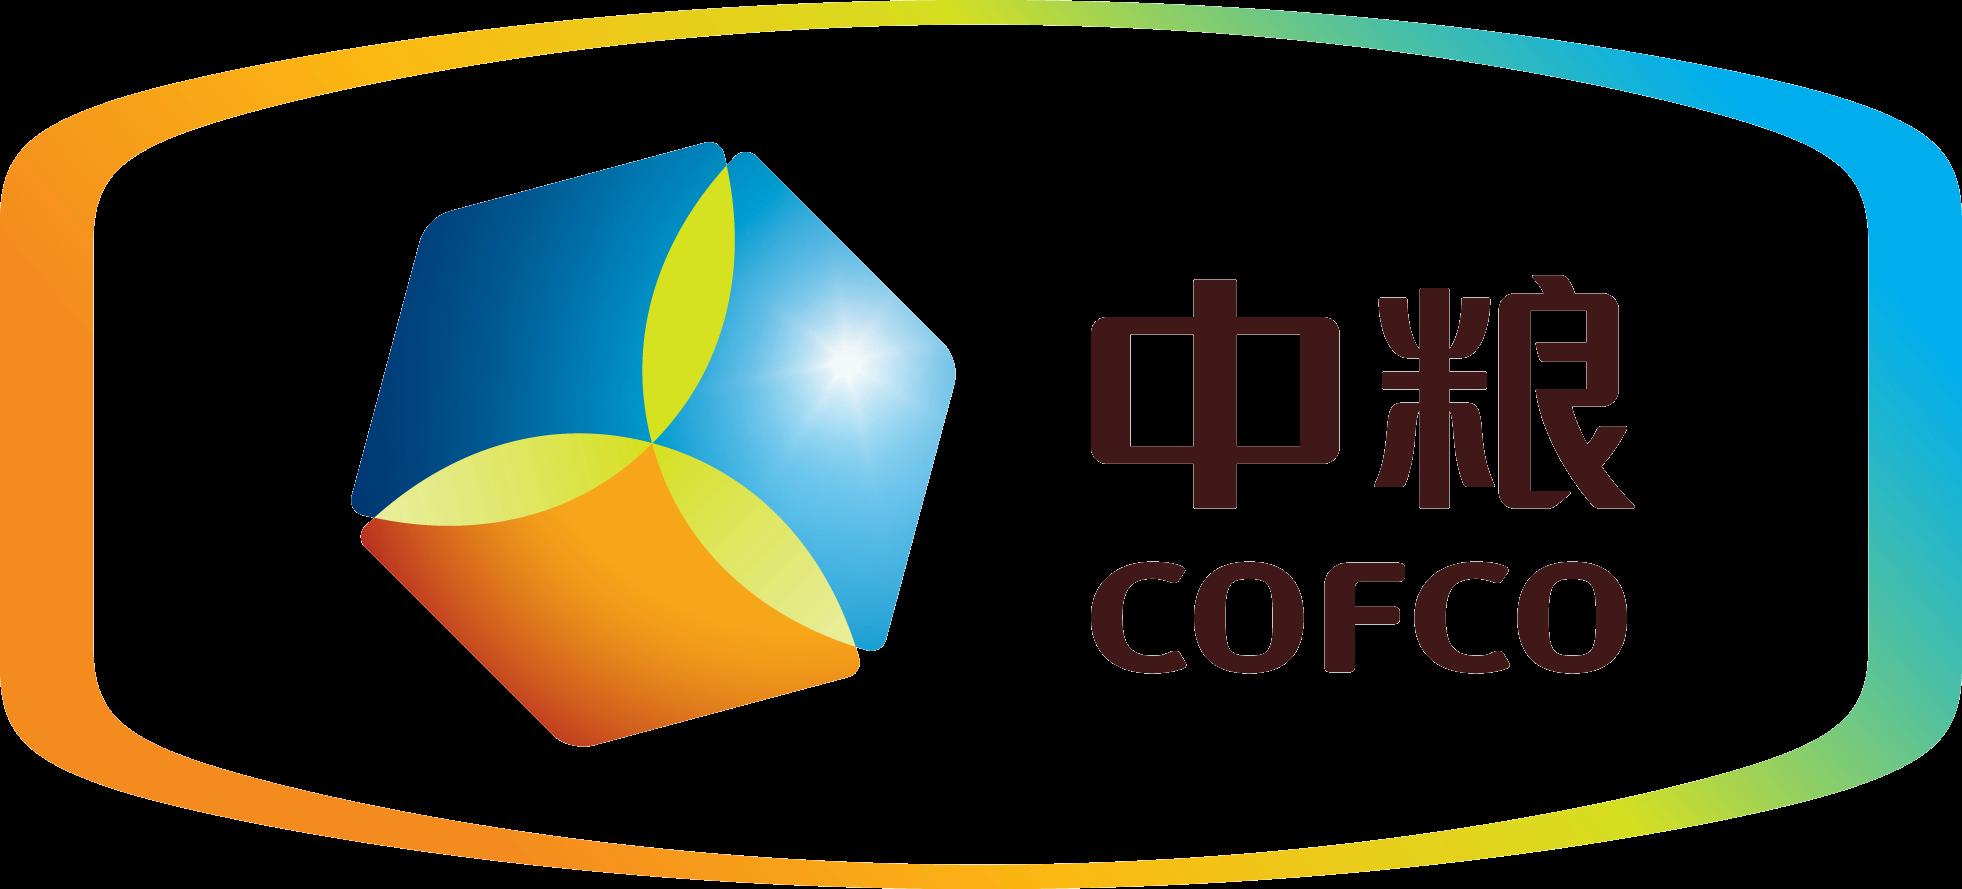 COFCO_Group_logo